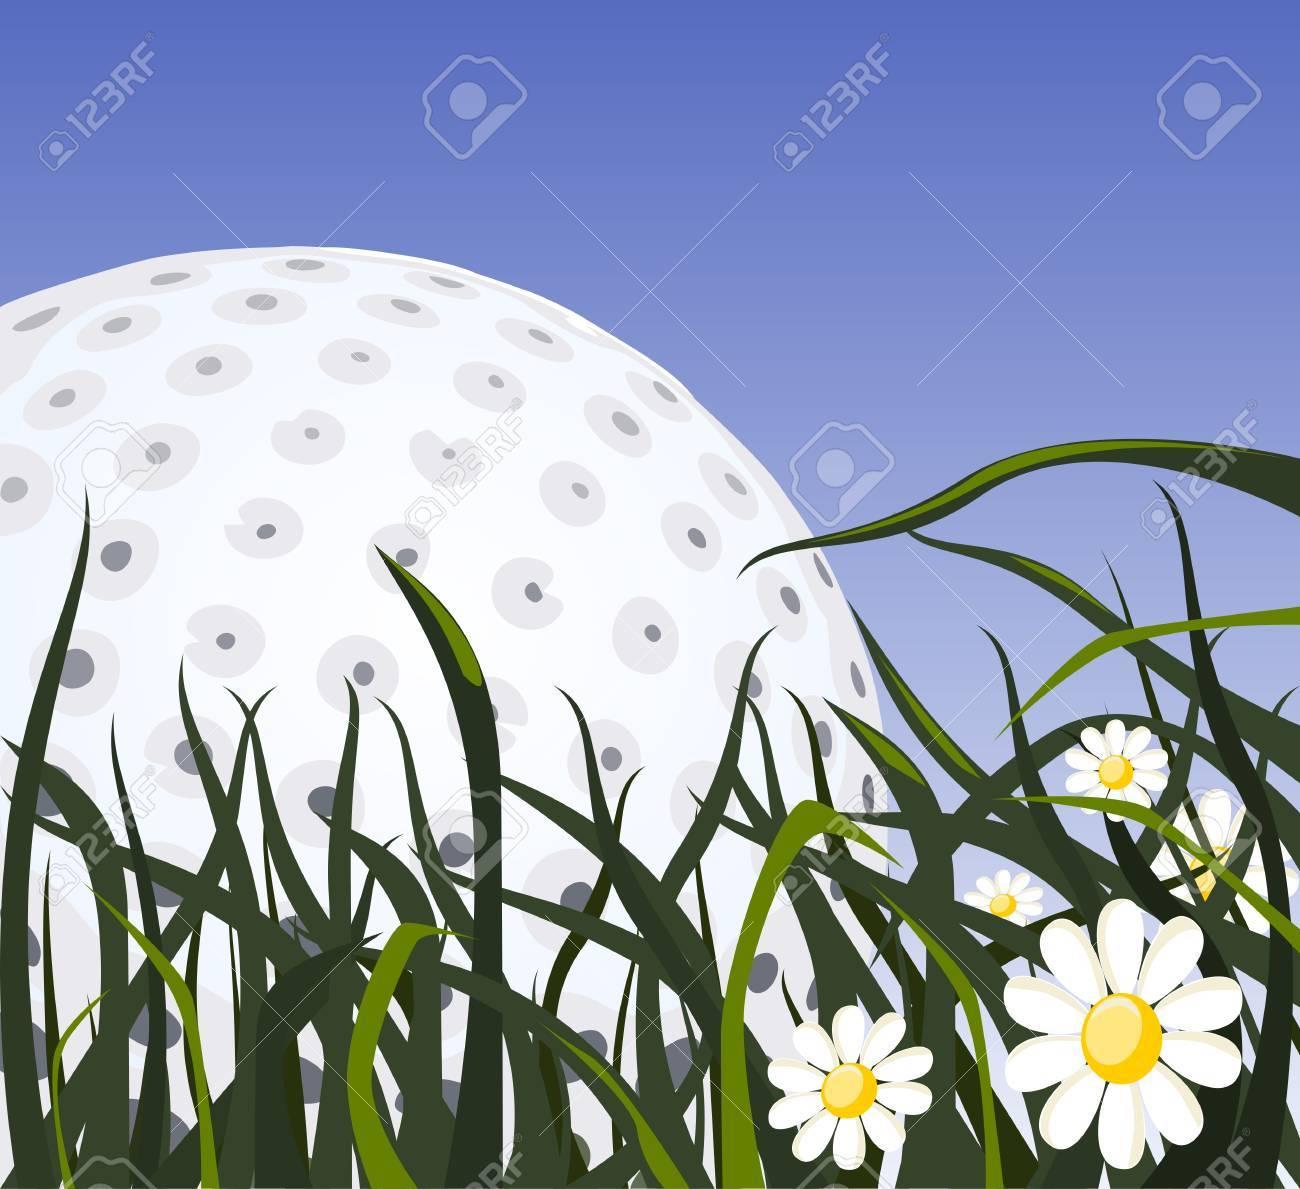 Abstract sport background (Golf Ball Vector) Stock Vector - 3856675